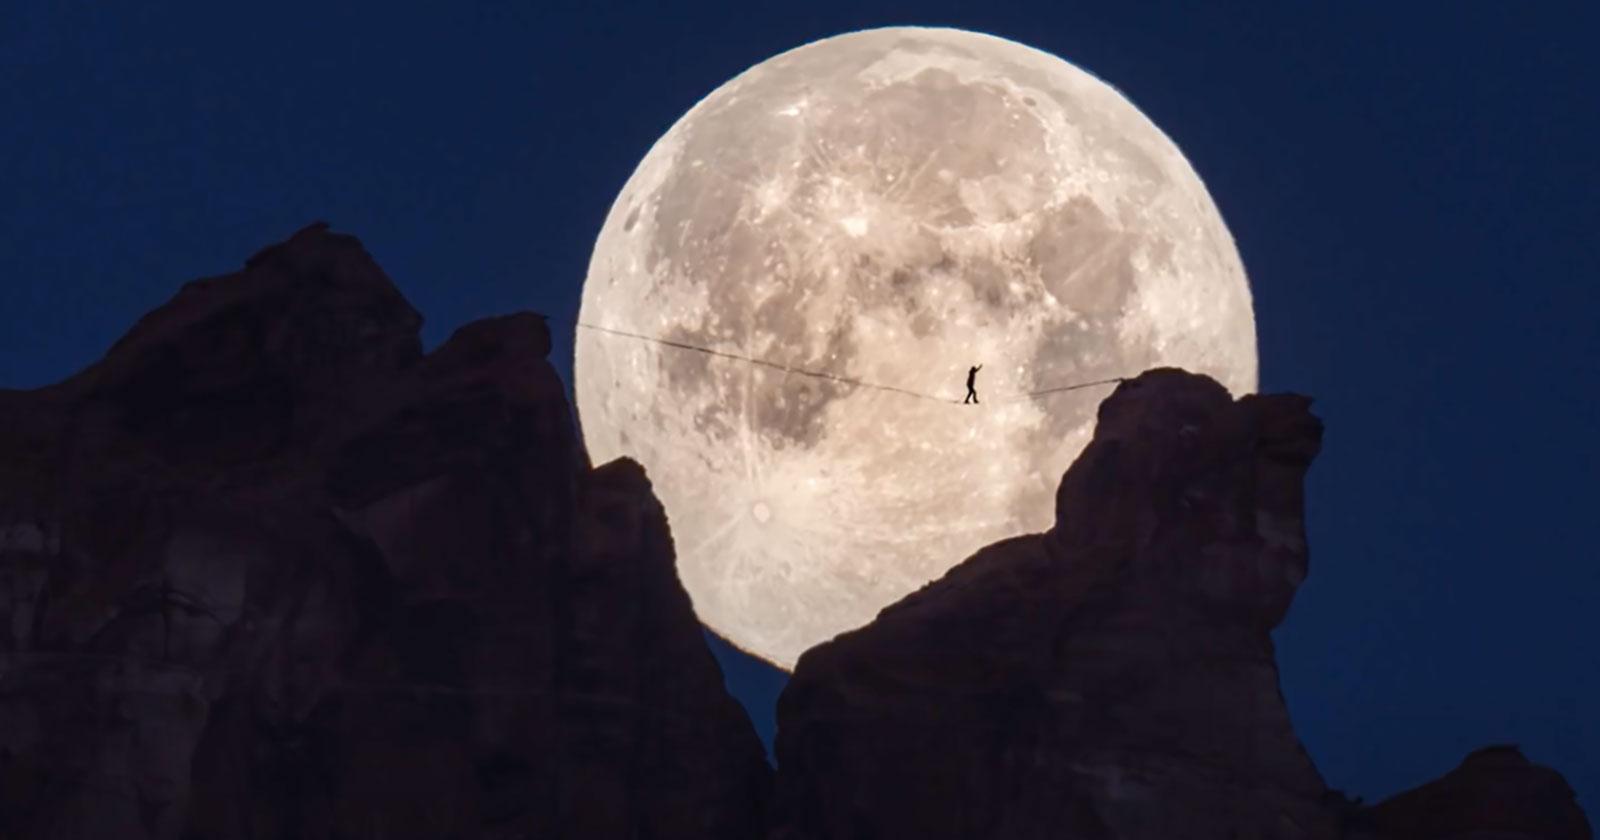 Moonwalk: A Sony Alpha Film shot on Sony a7S III